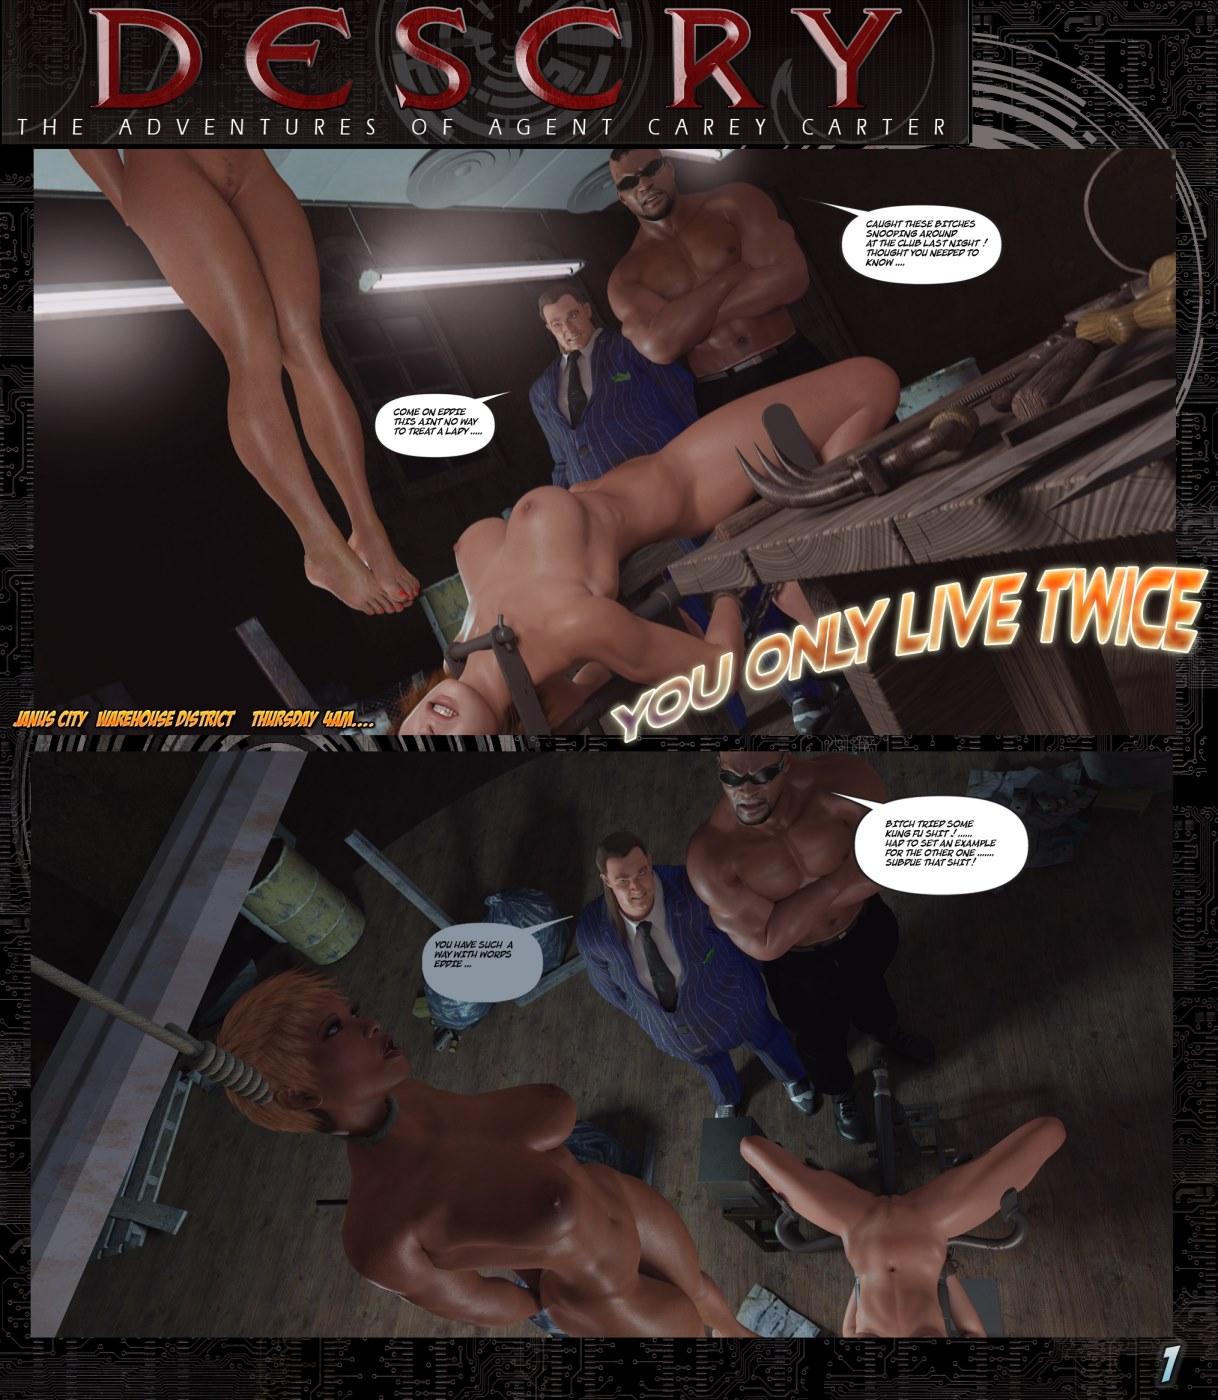 Descry- Adventures of Agent Carey image 1